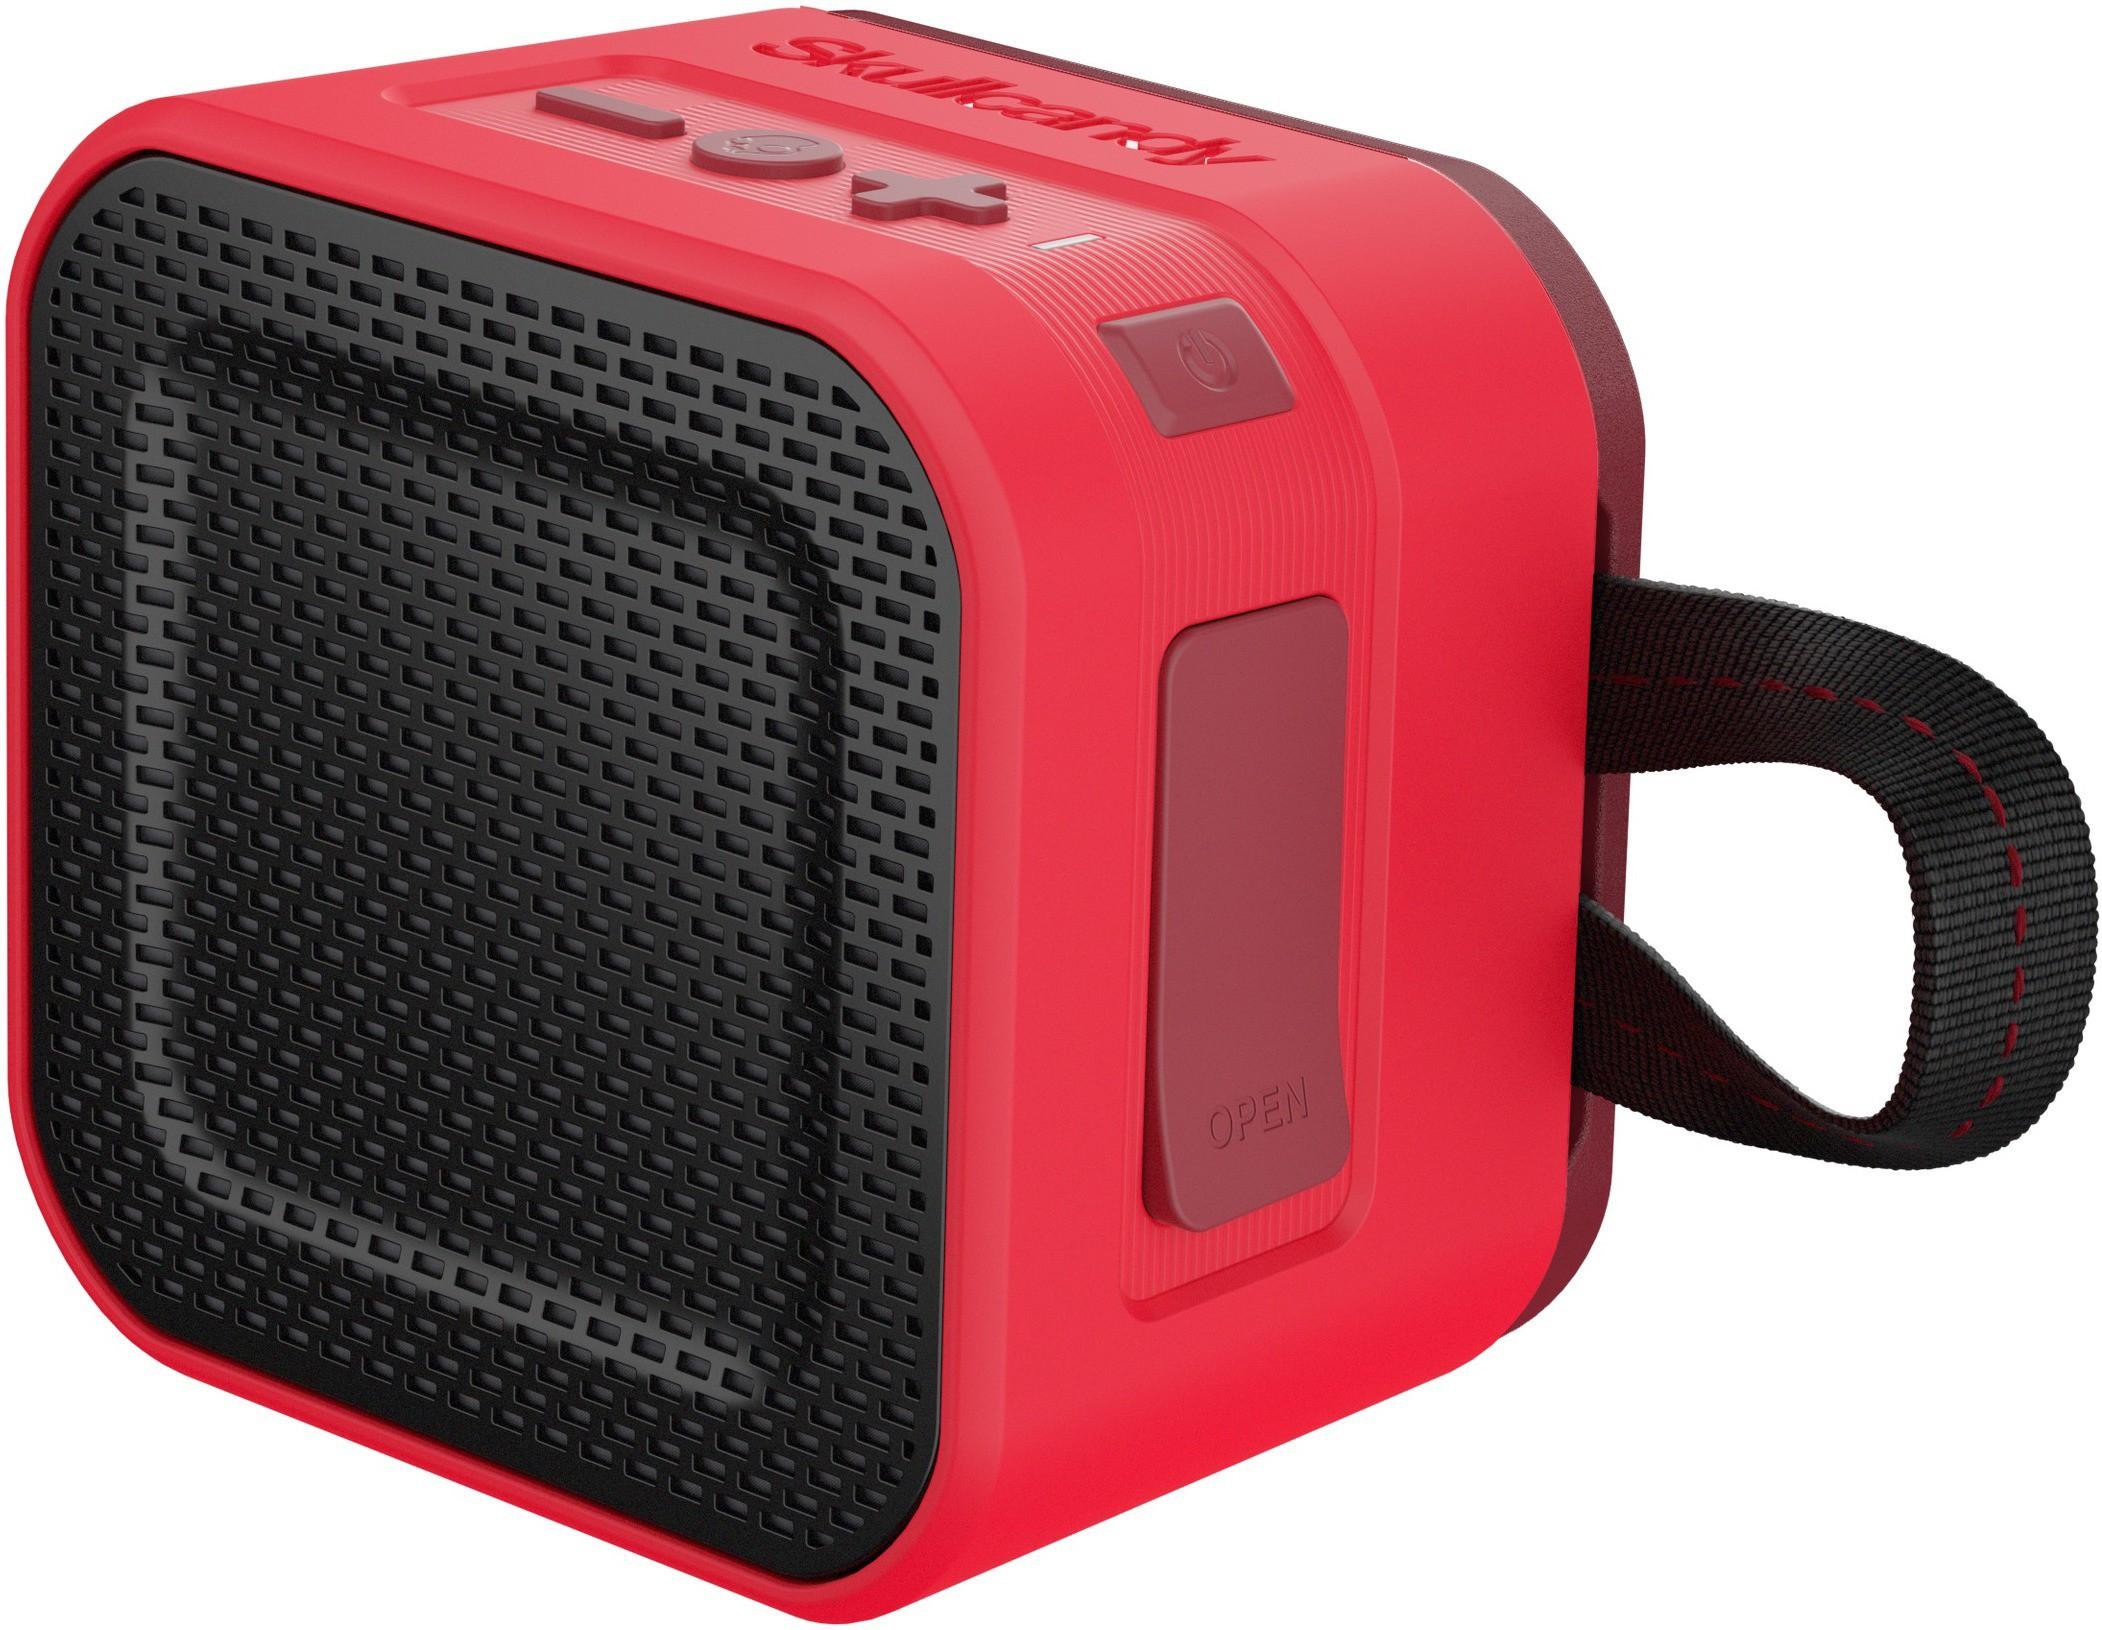 Skullcandy S7PBW-J584 Barricade Mini Portable Bluetooth Mobile/Tablet Speaker(Red Black, 1.0 Channel)